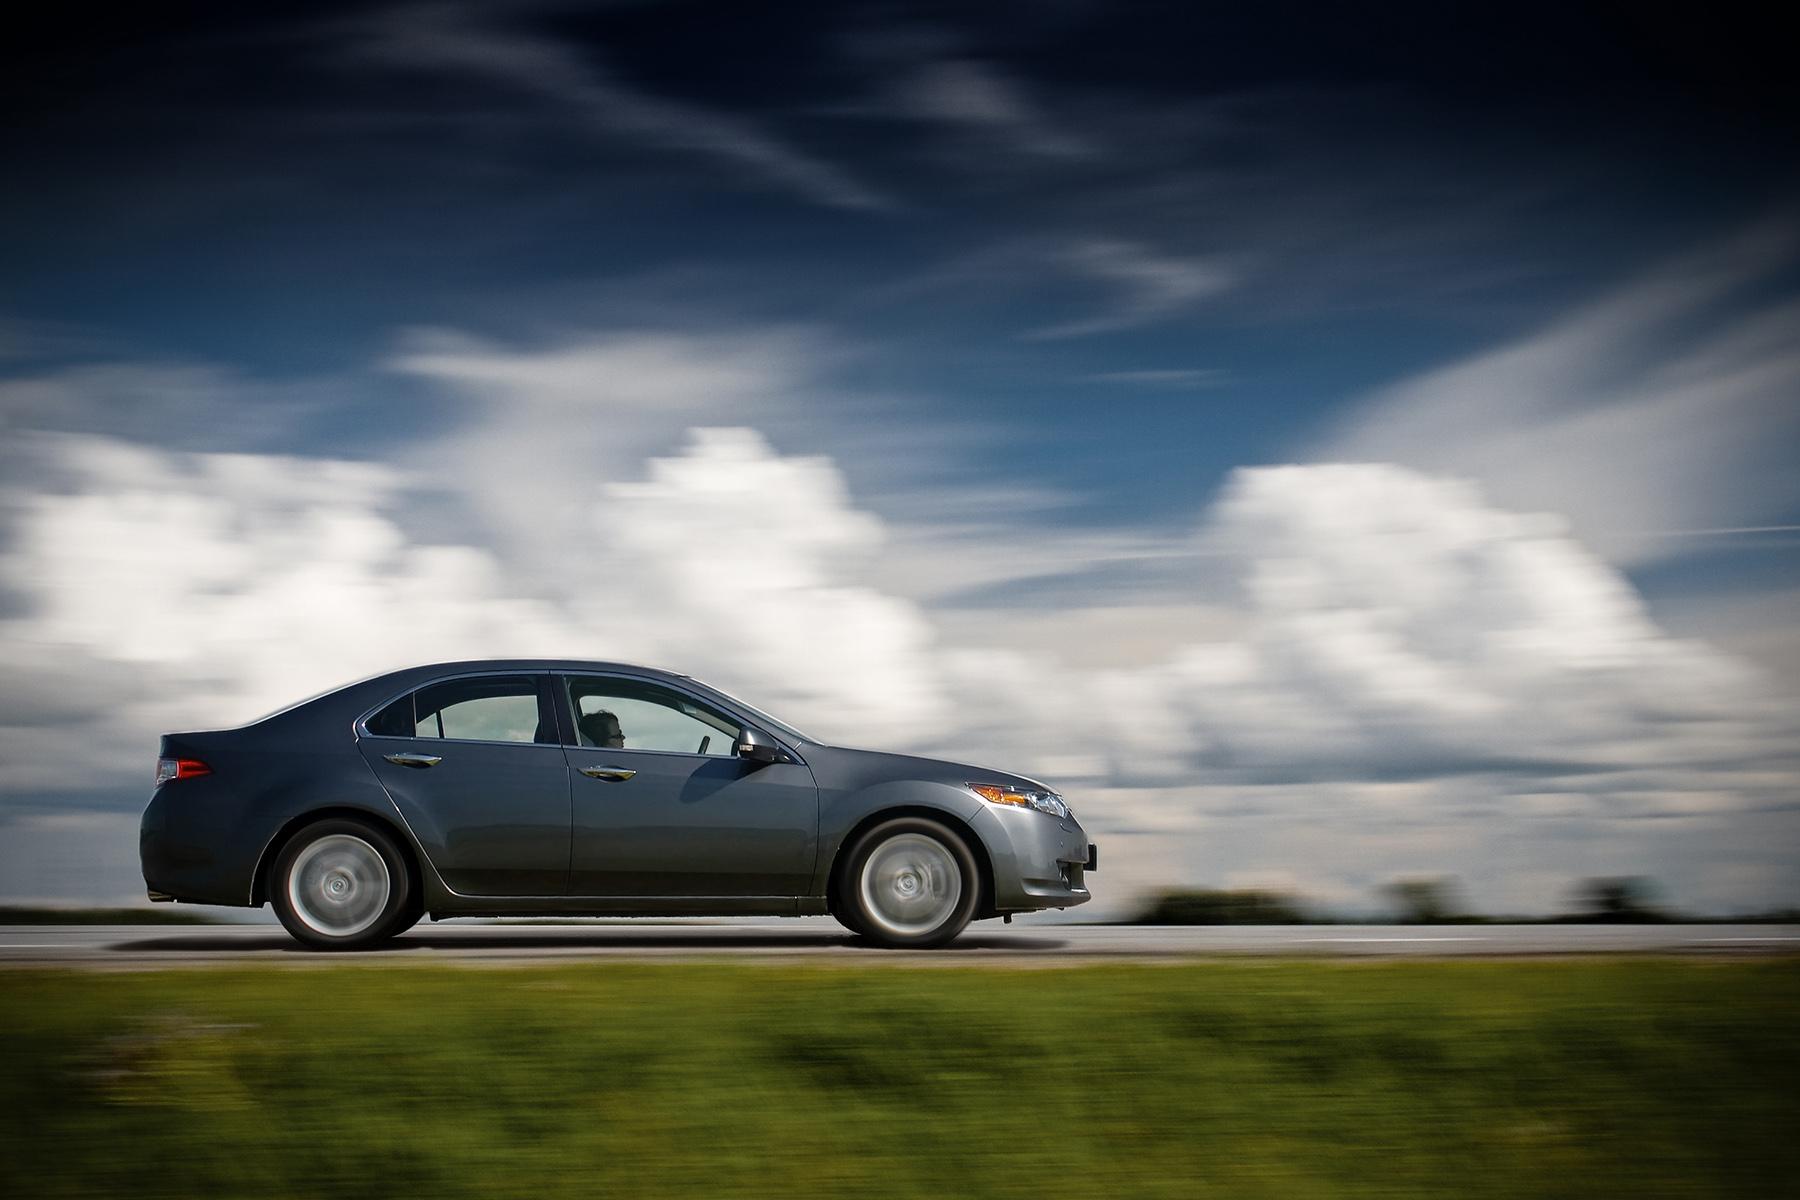 Car Driving Fast | Photosfine